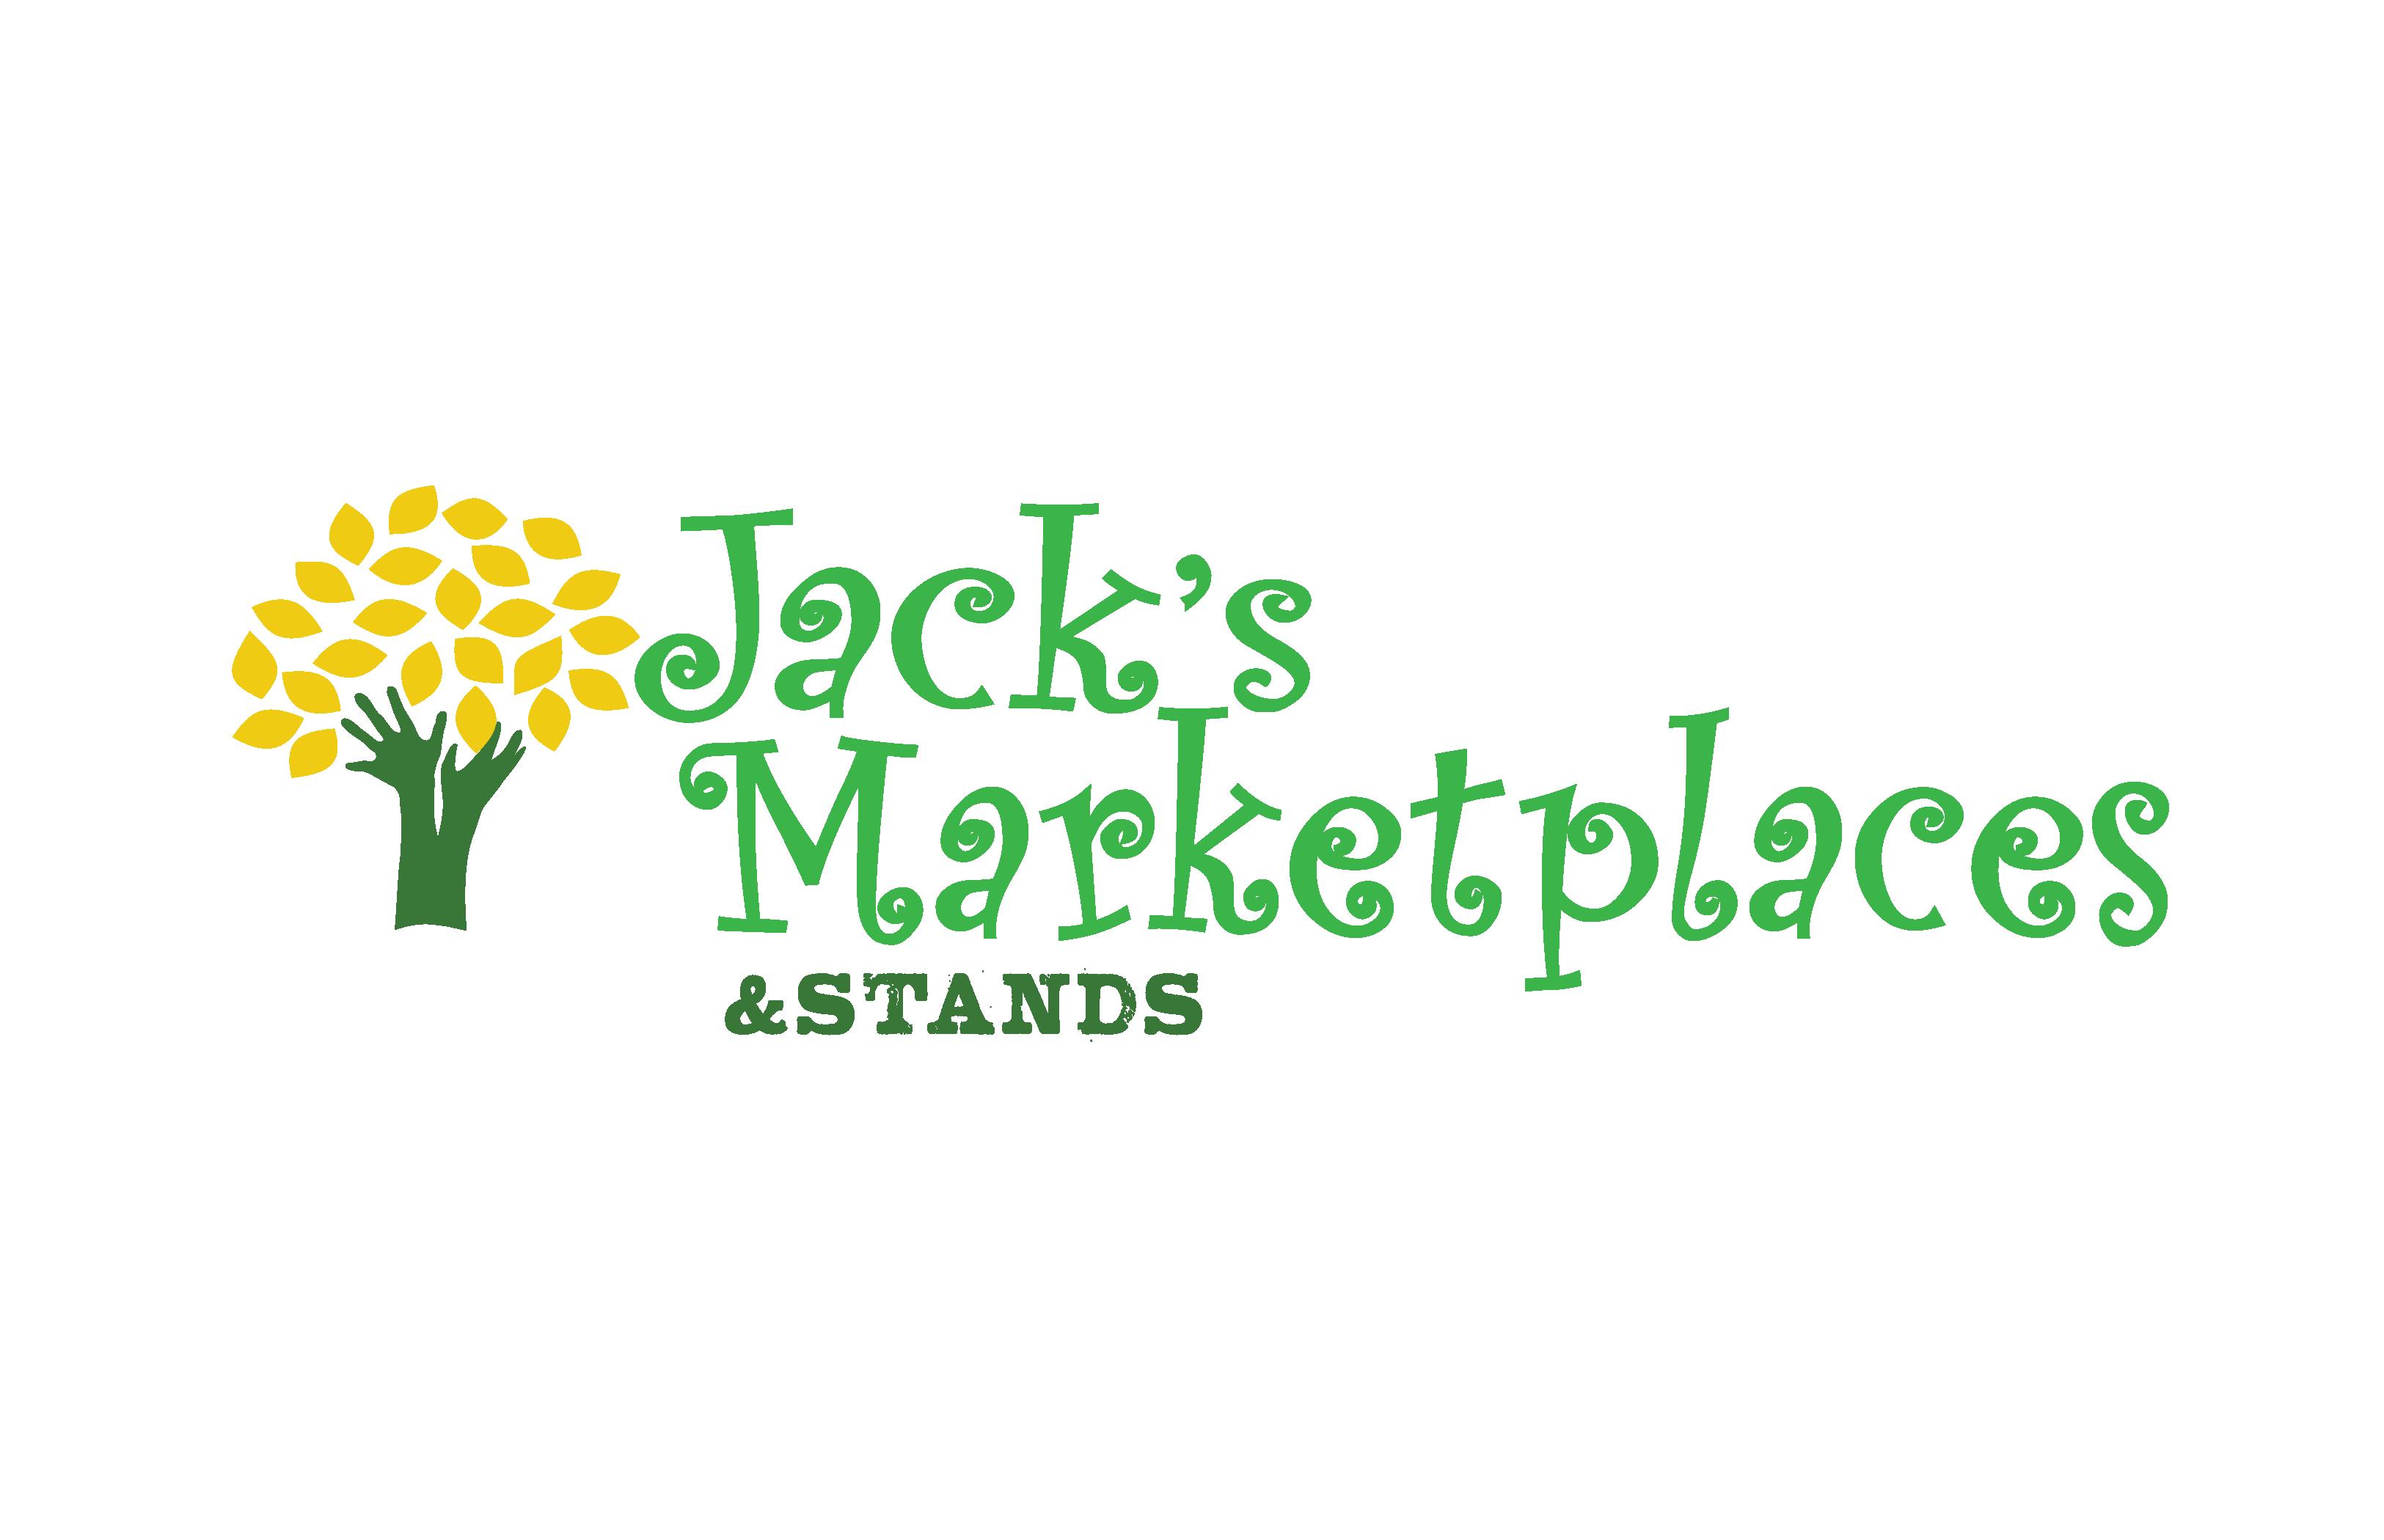 Jack's Marketplace Store